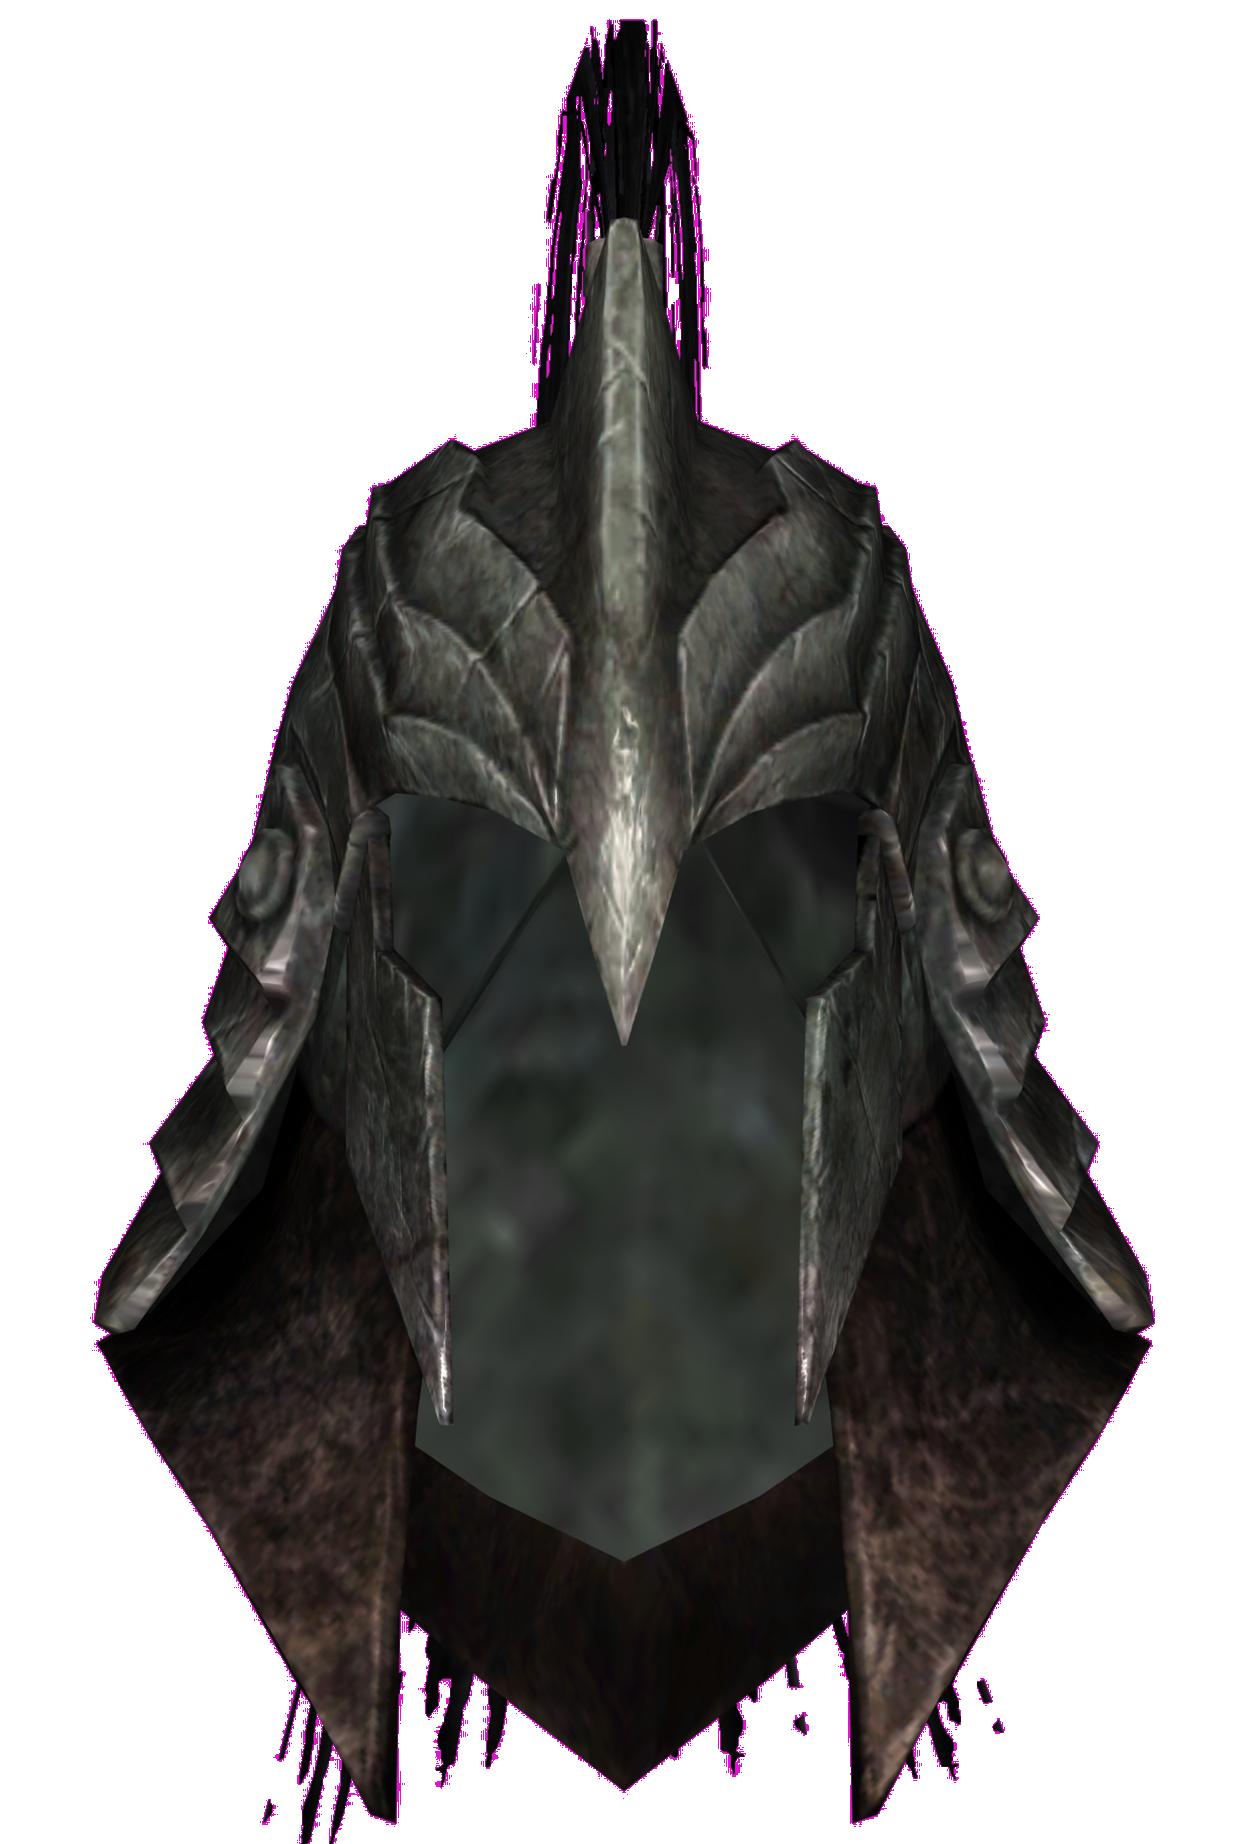 Orcish Helmet (Skyrim)   Elder Scrolls   FANDOM powered by ...